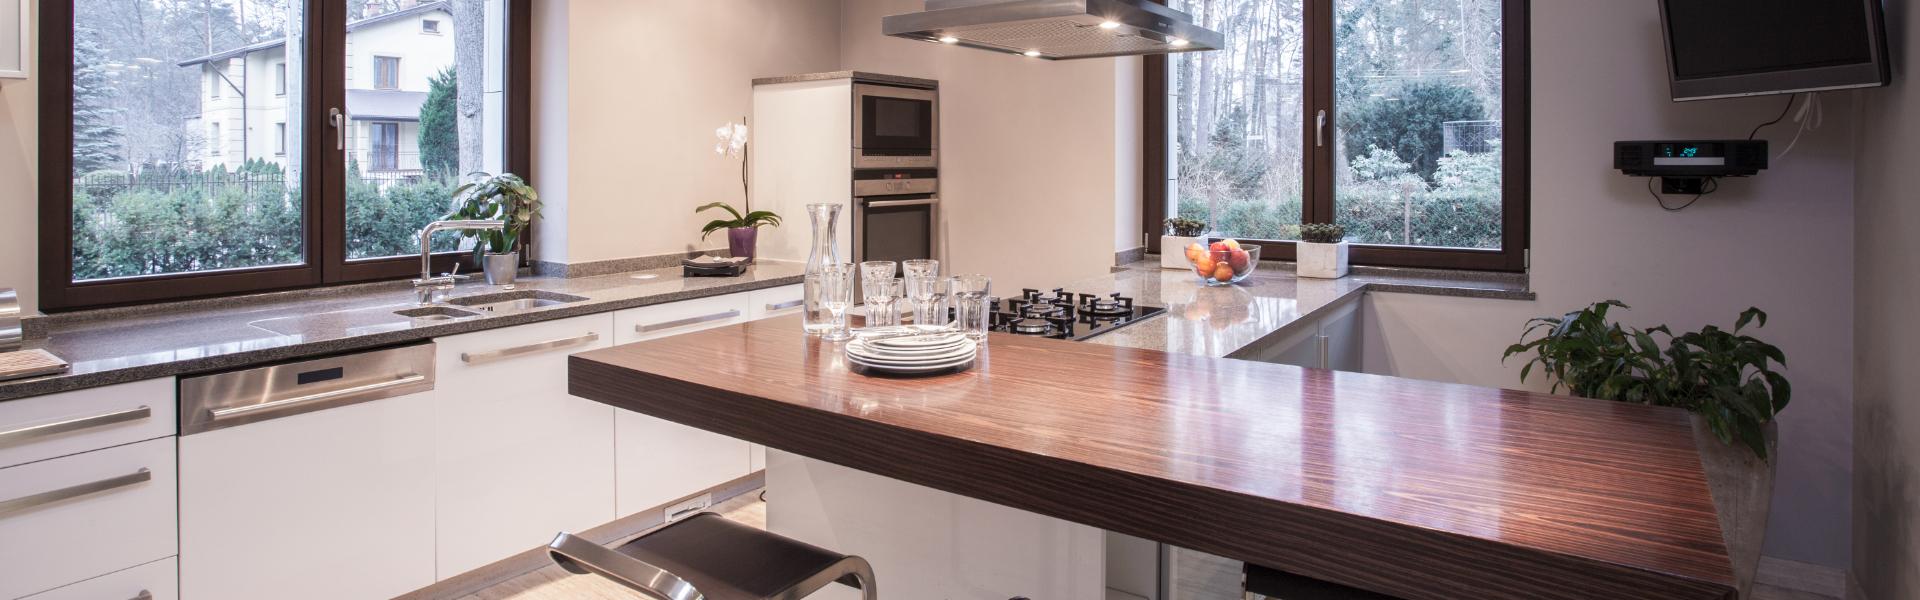 Belmax Builders Kitchen Fitting